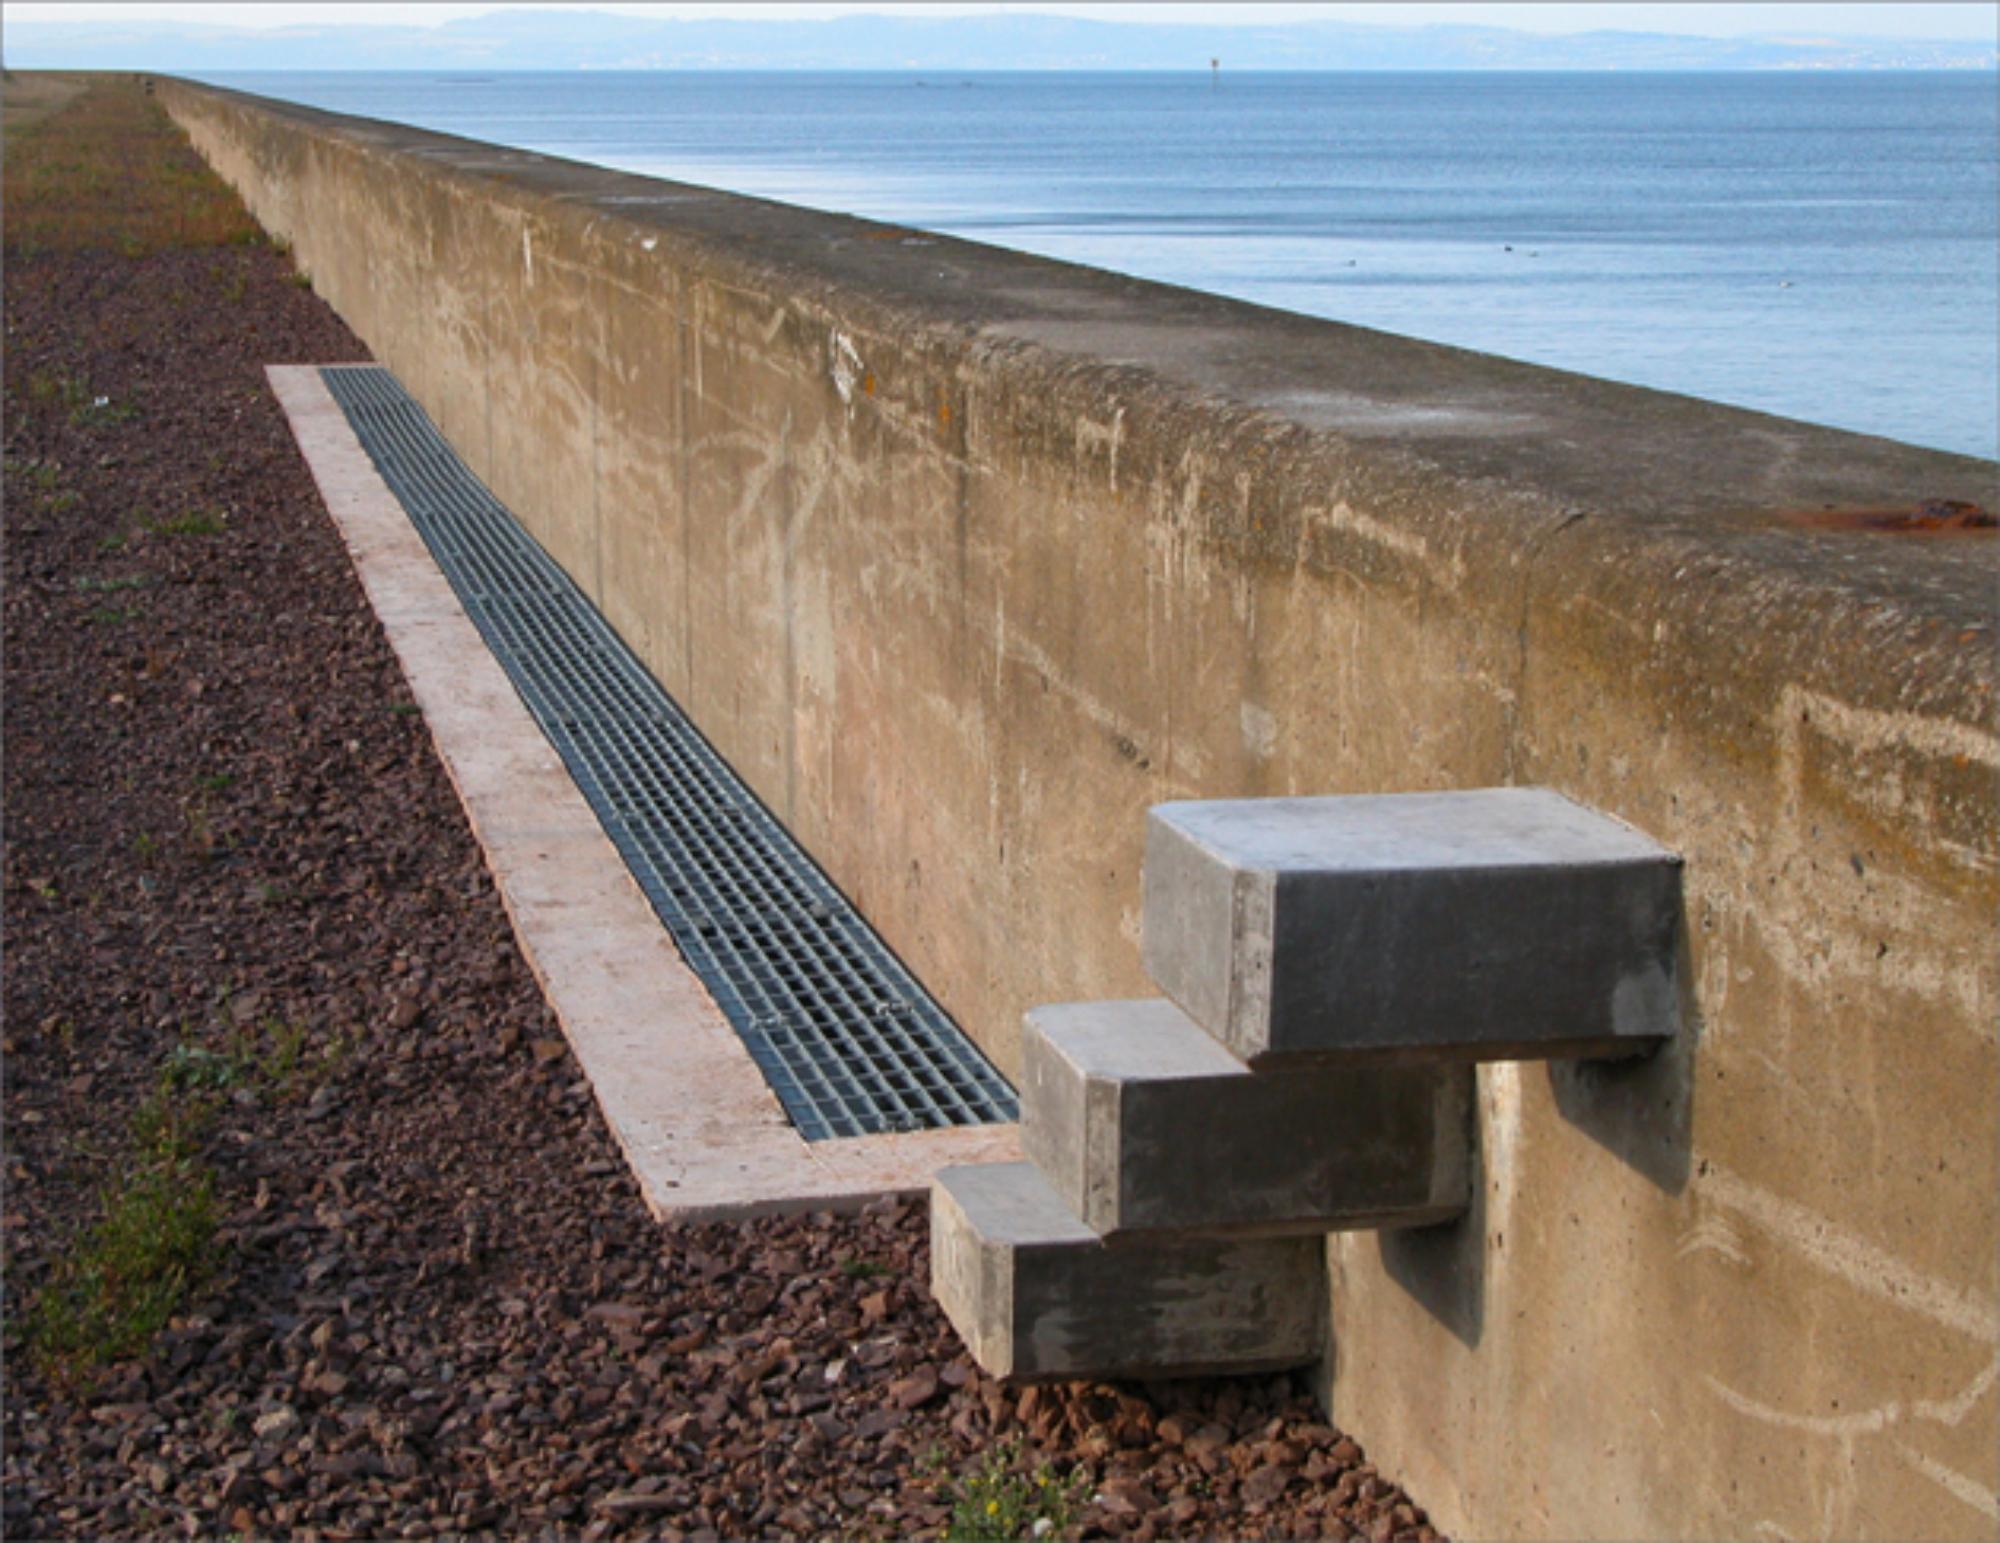 Seafield Waste Water Treatment Works Edinburgh